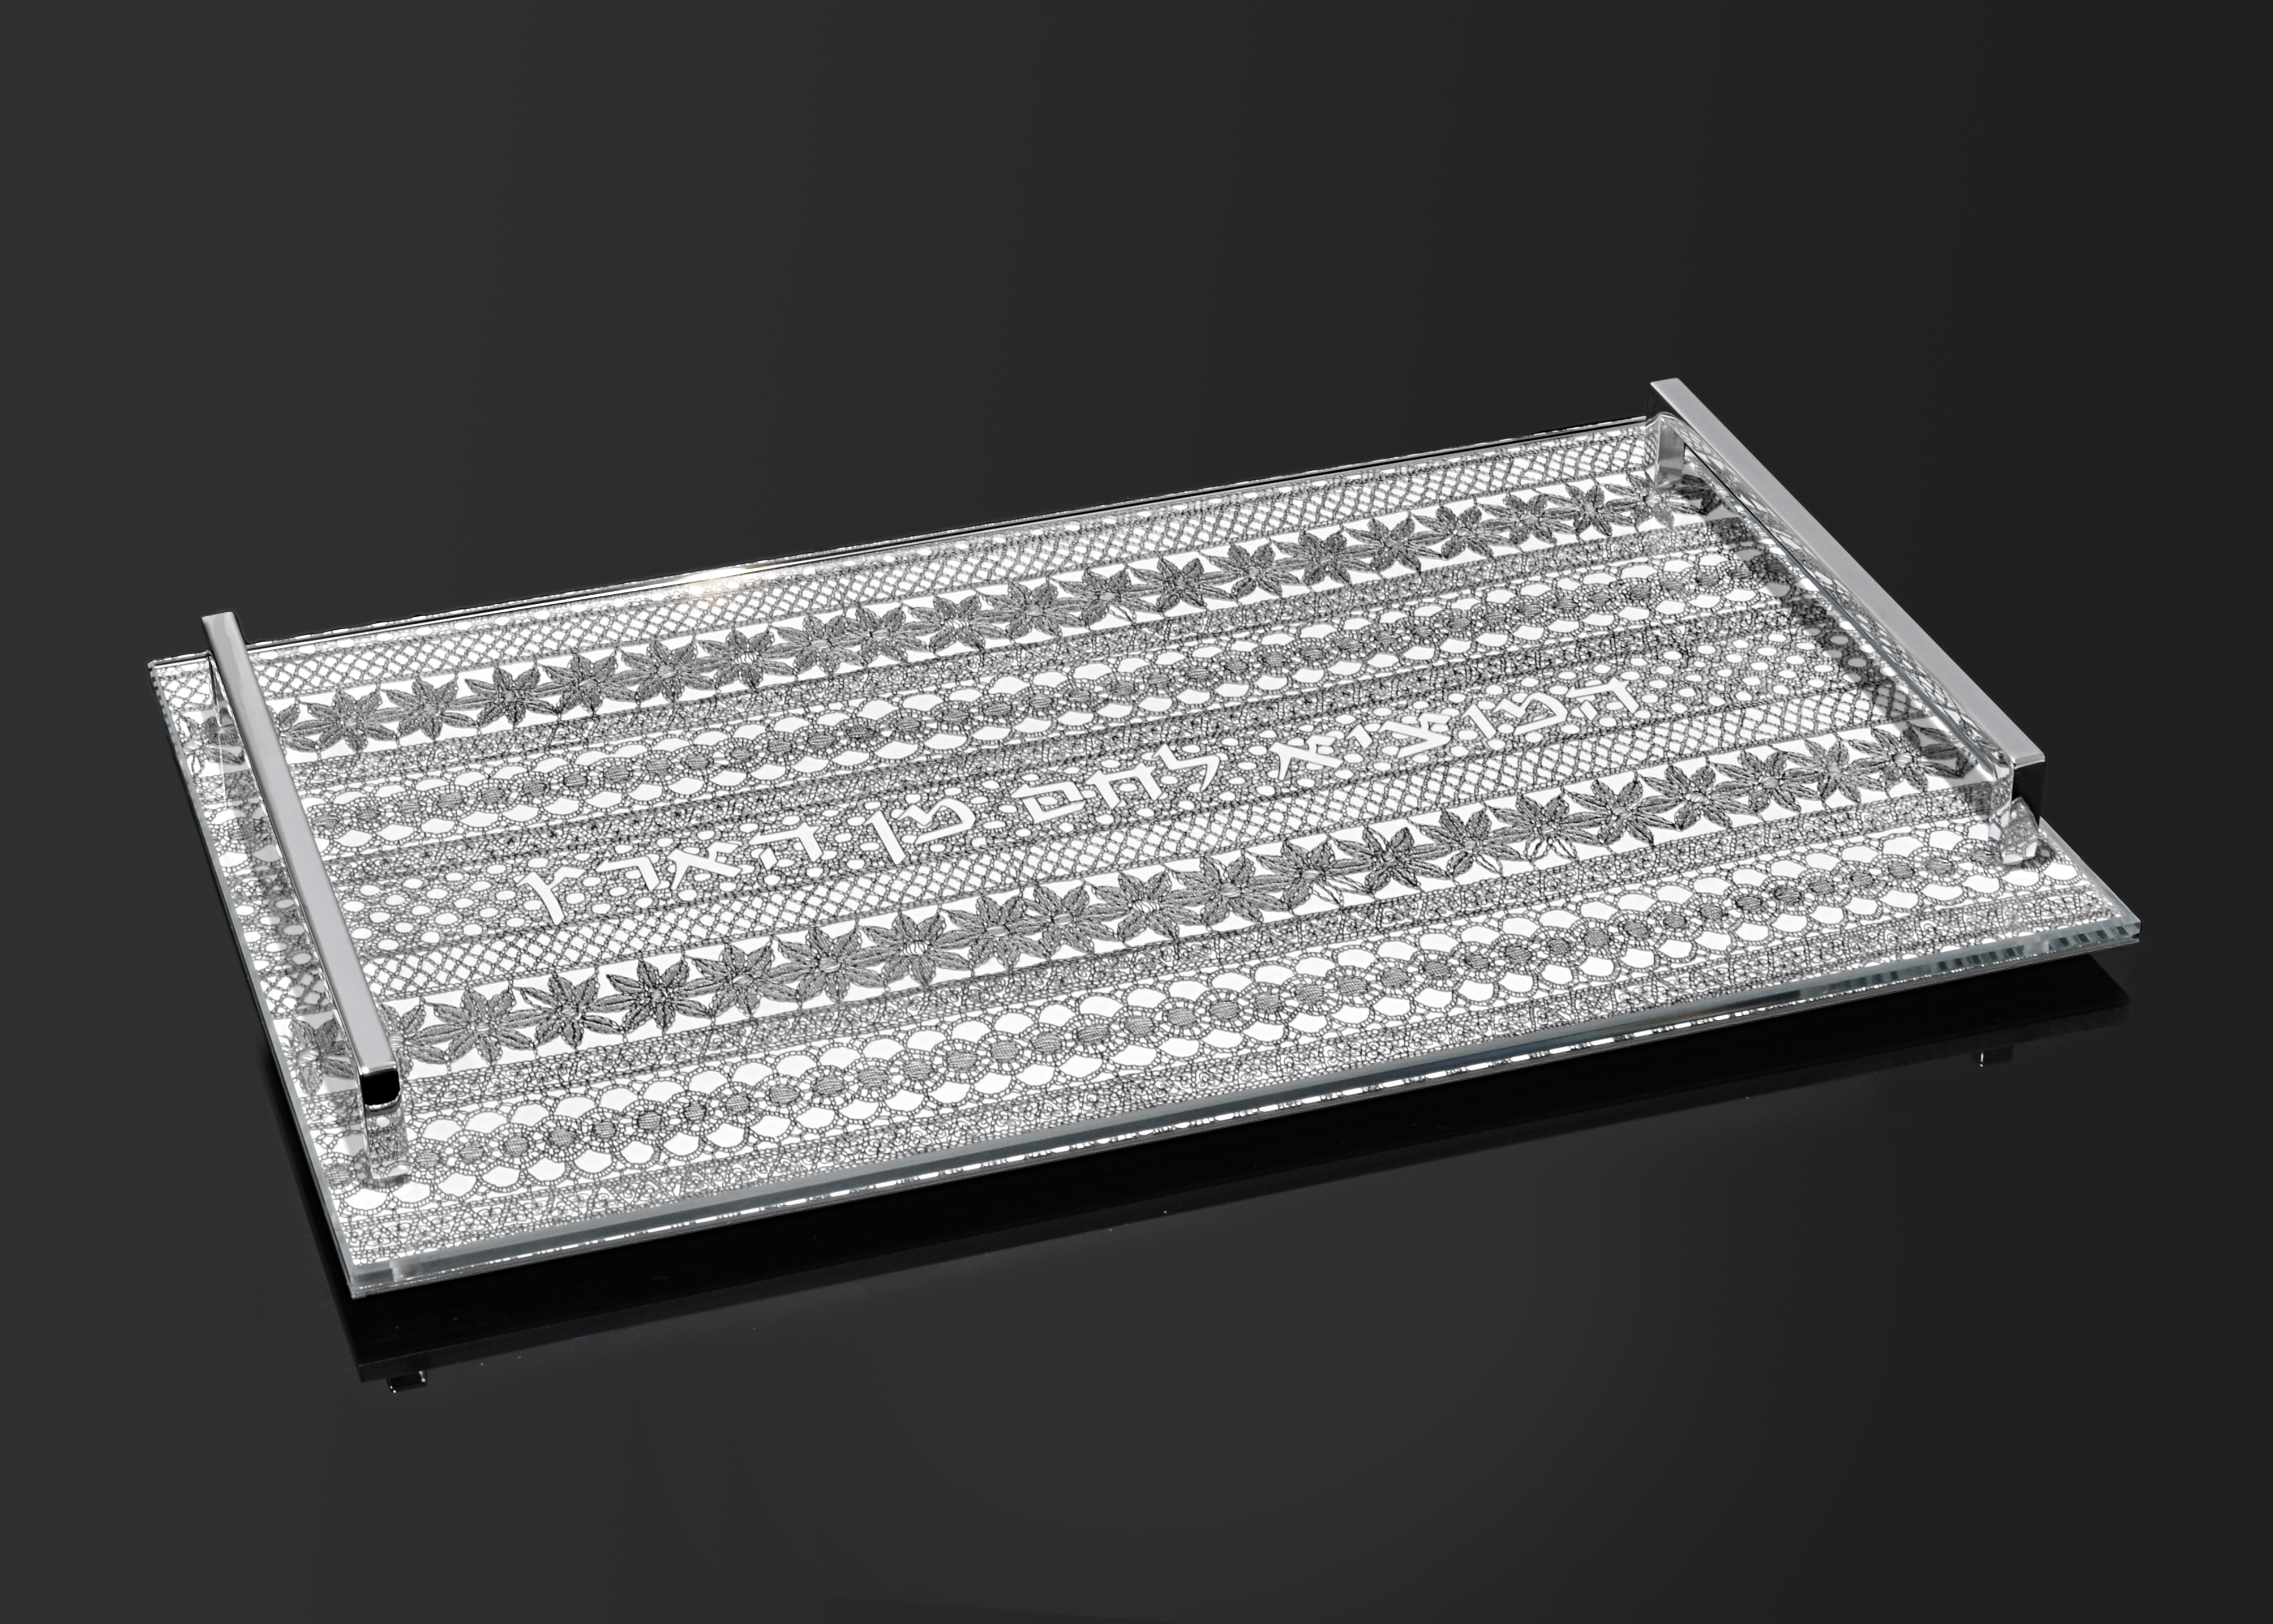 Ribbon Lace Serving Challah Board- w by Metal Lace Art